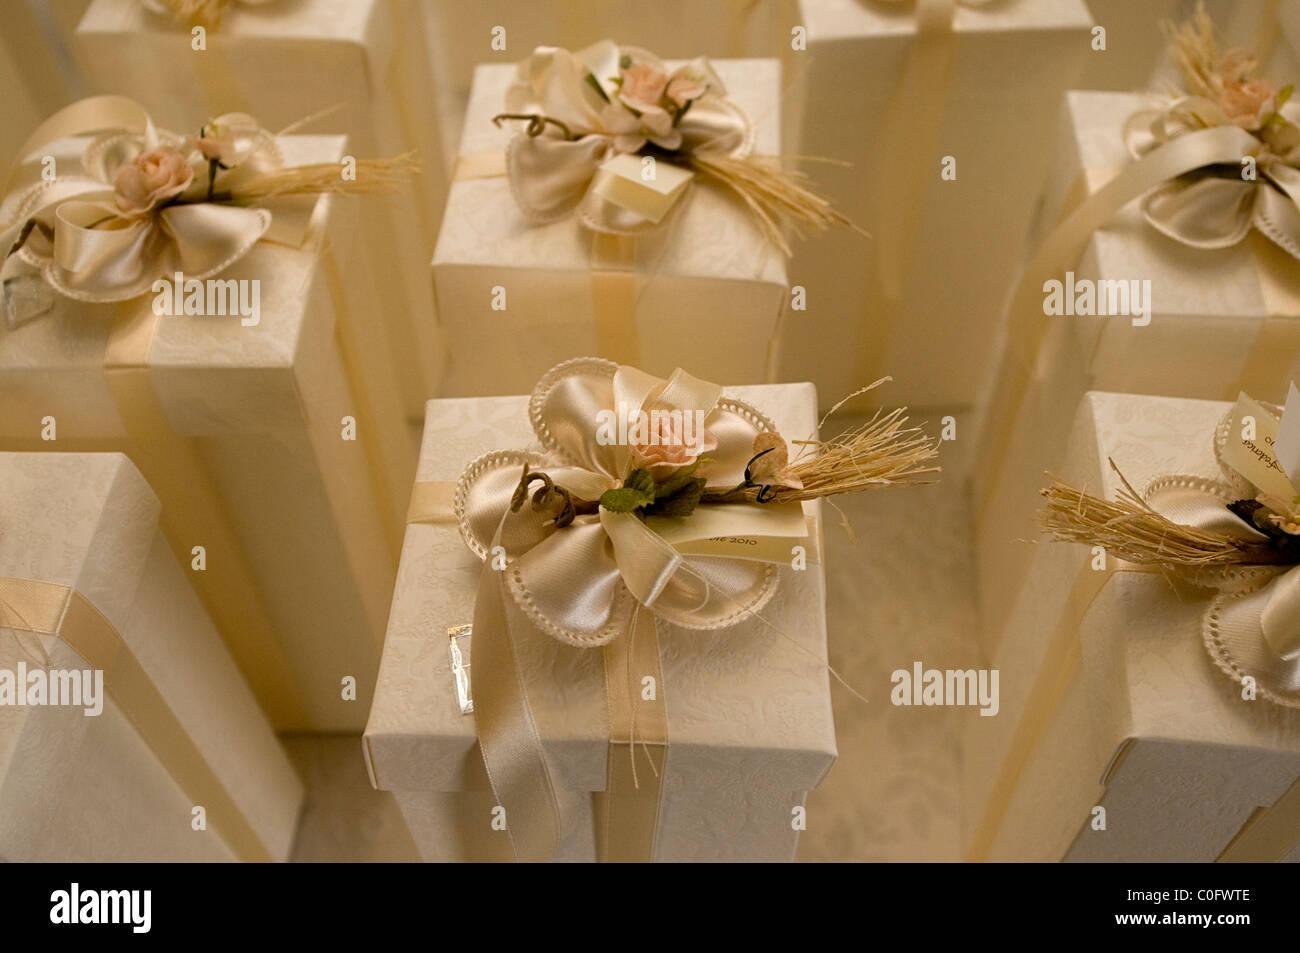 f6cd3f77d7f8d wedding presents Stock Photo: 34770302 - Alamy